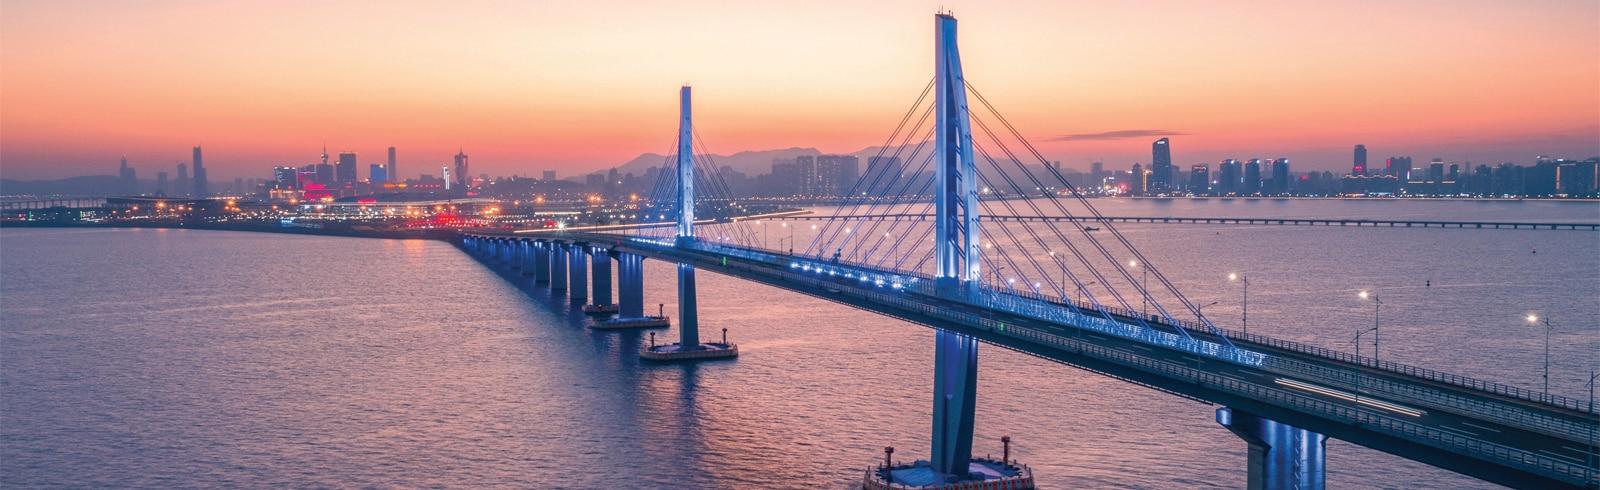 Building, Bridge, Metropolis